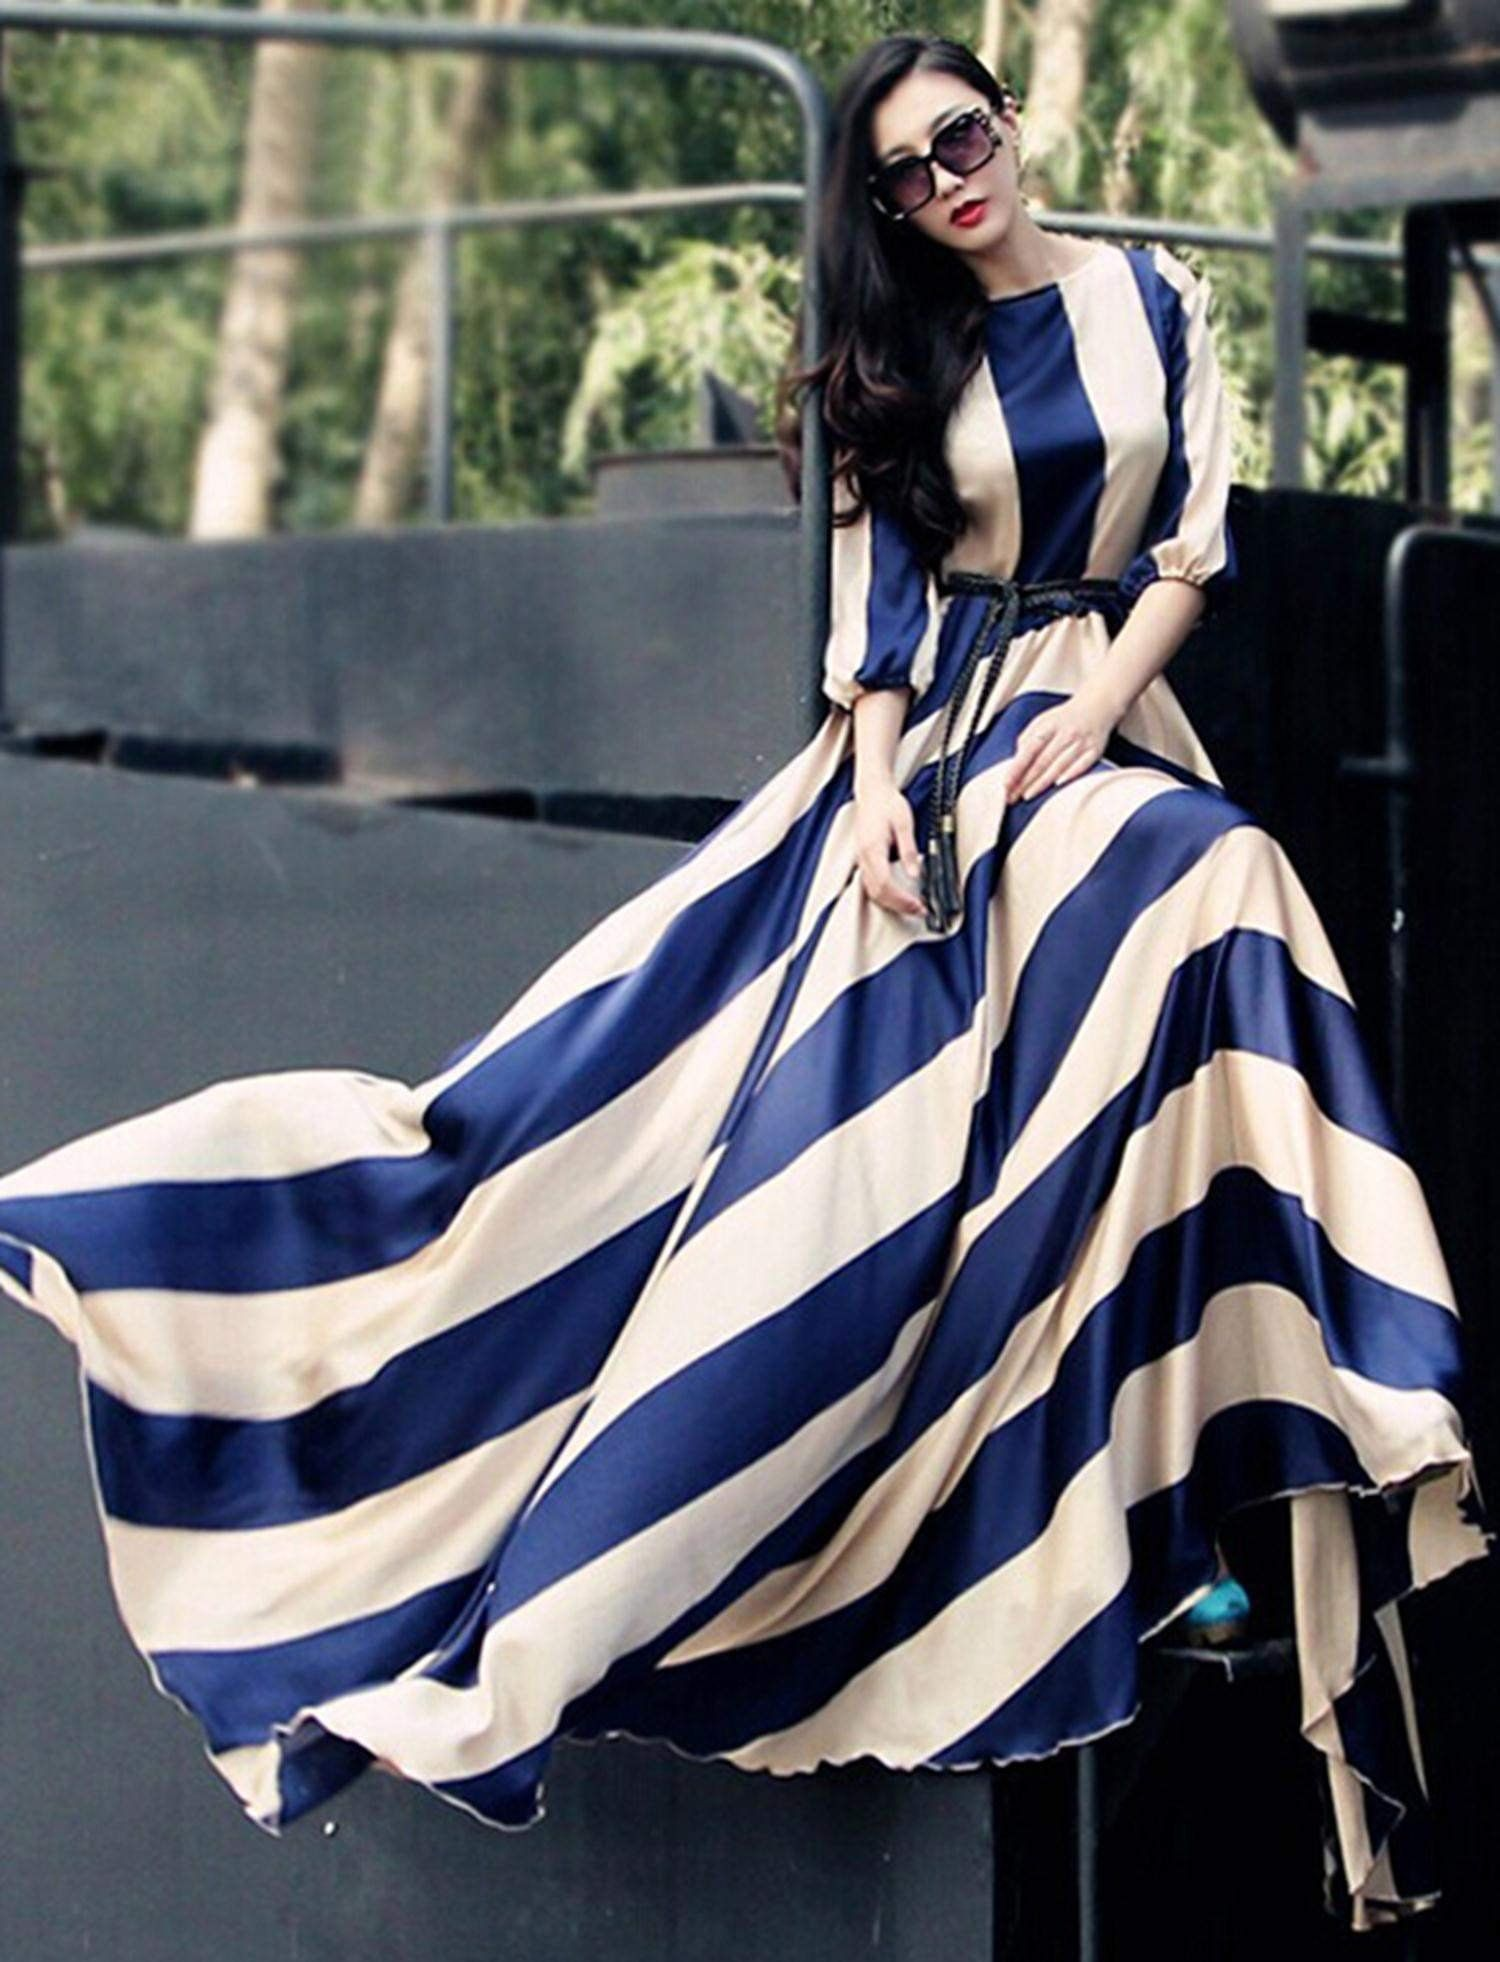 Pin by Весна Vesna on maxi dresses | Pinterest | Maxi dresses, Dress ...